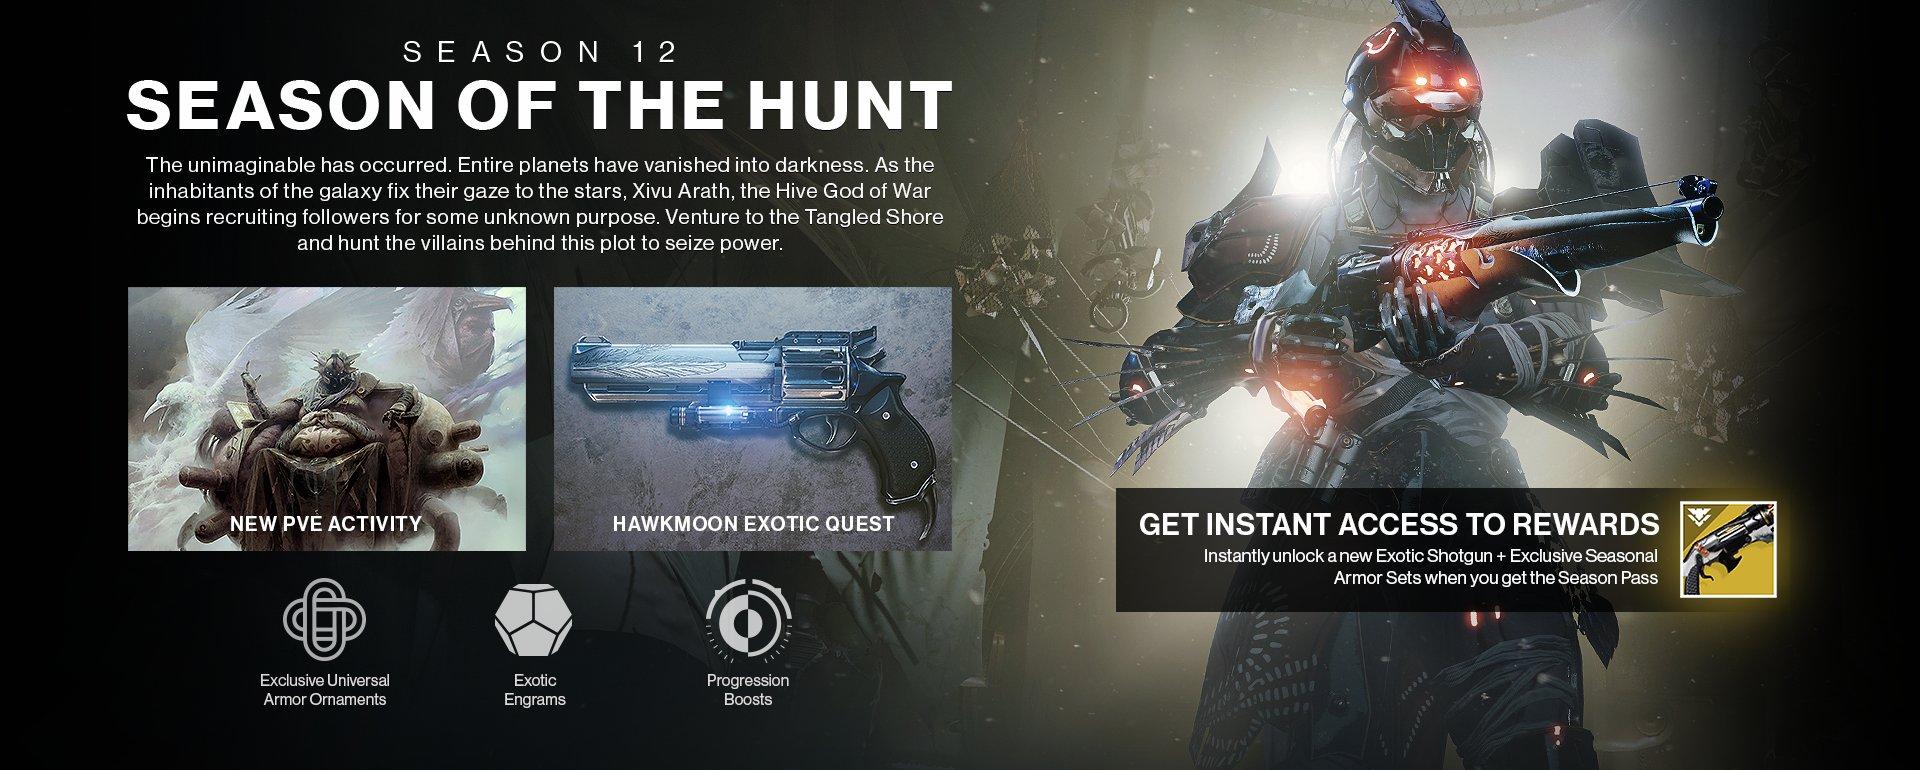 Seasonal activity season of the hunt